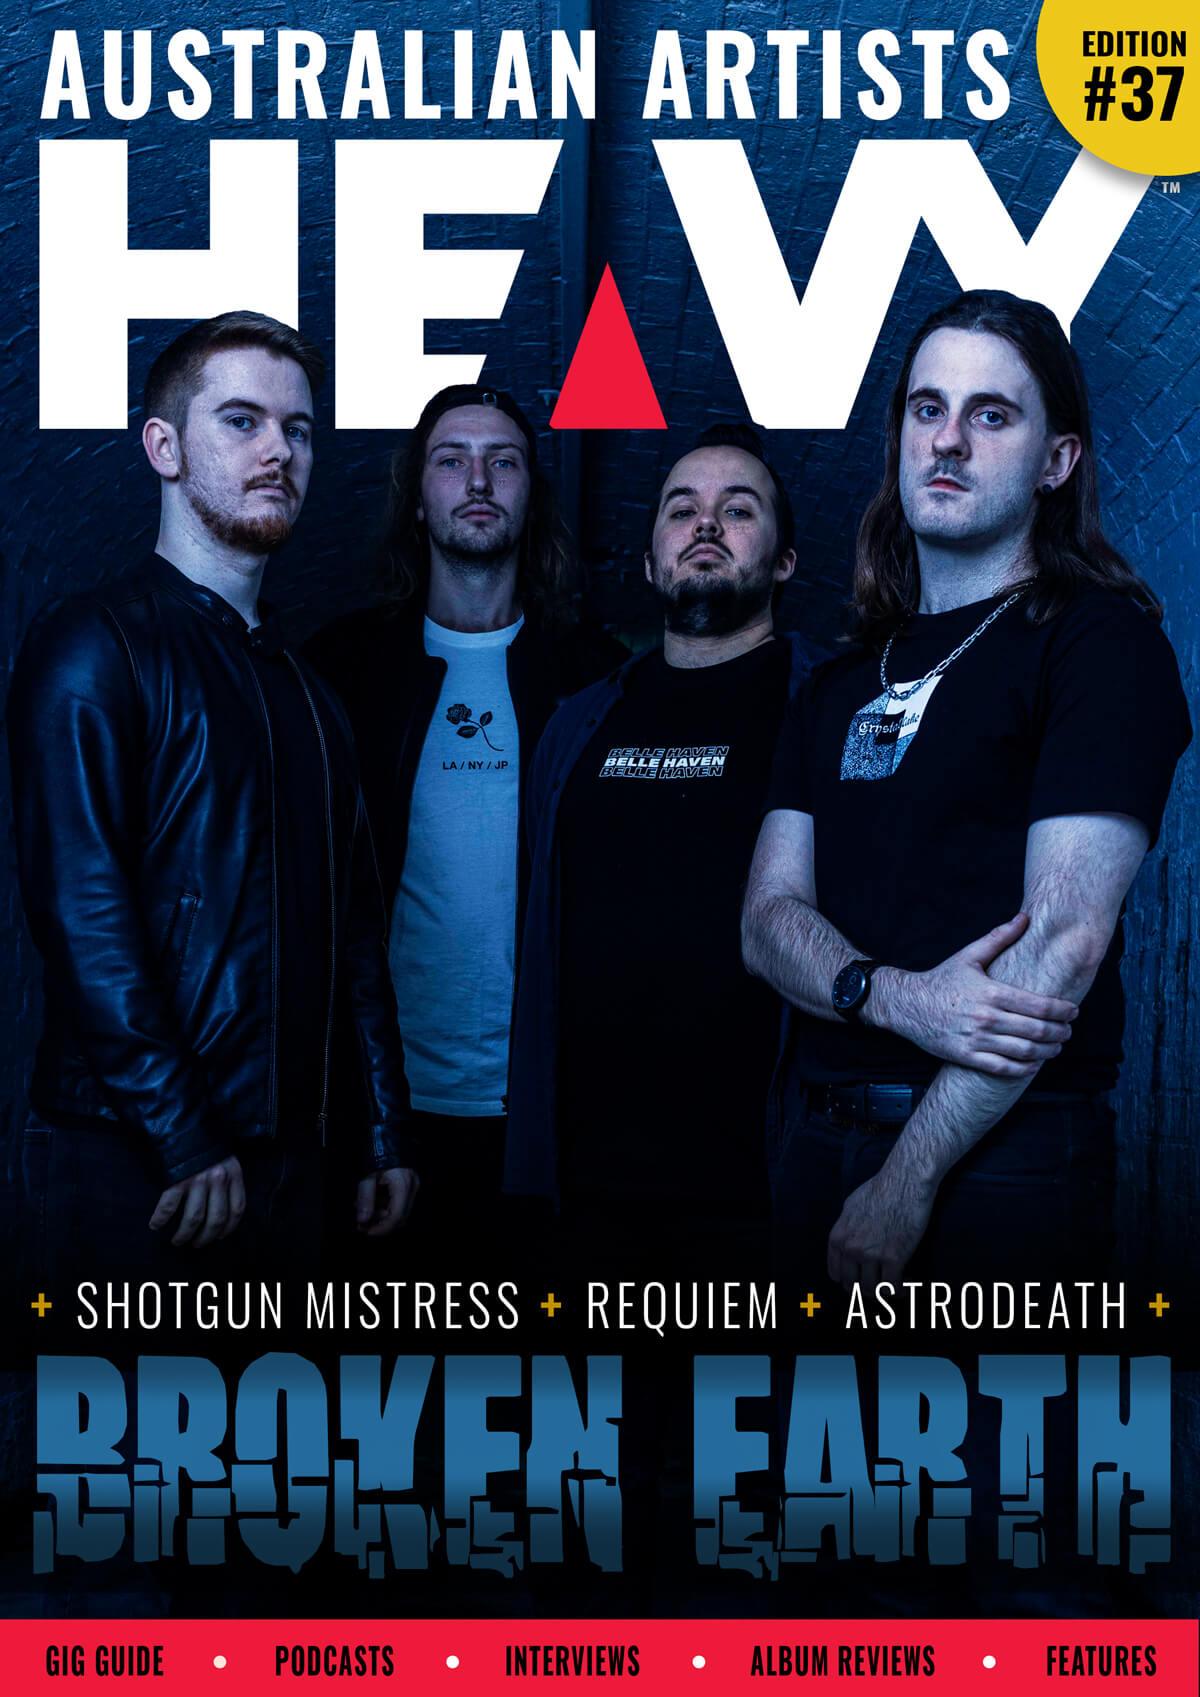 heavy-australian-artists-digi-mag-issue-#37